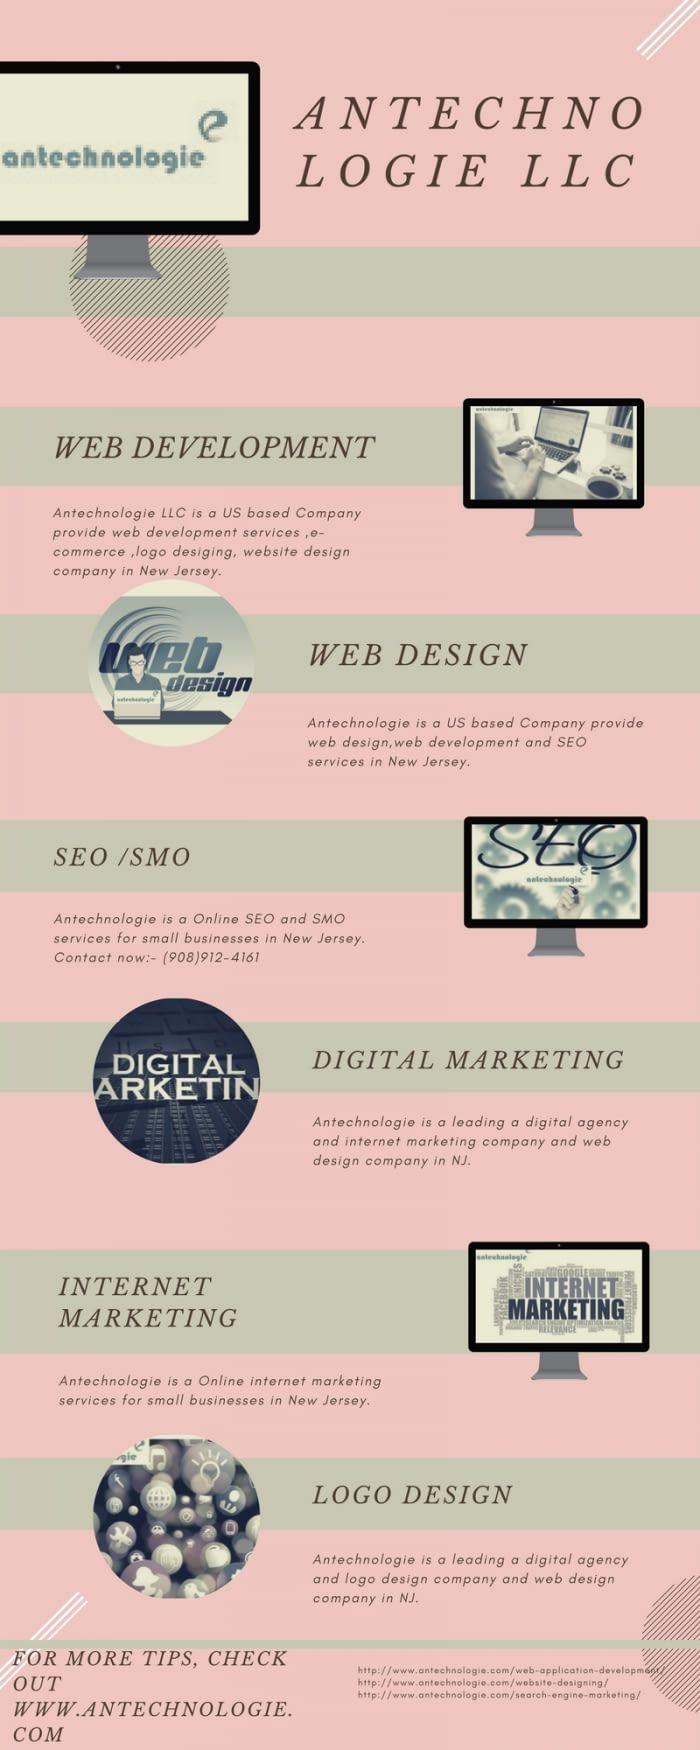 Responsive Web Design, Graphic Design, and Digital Marketing Services In Edison